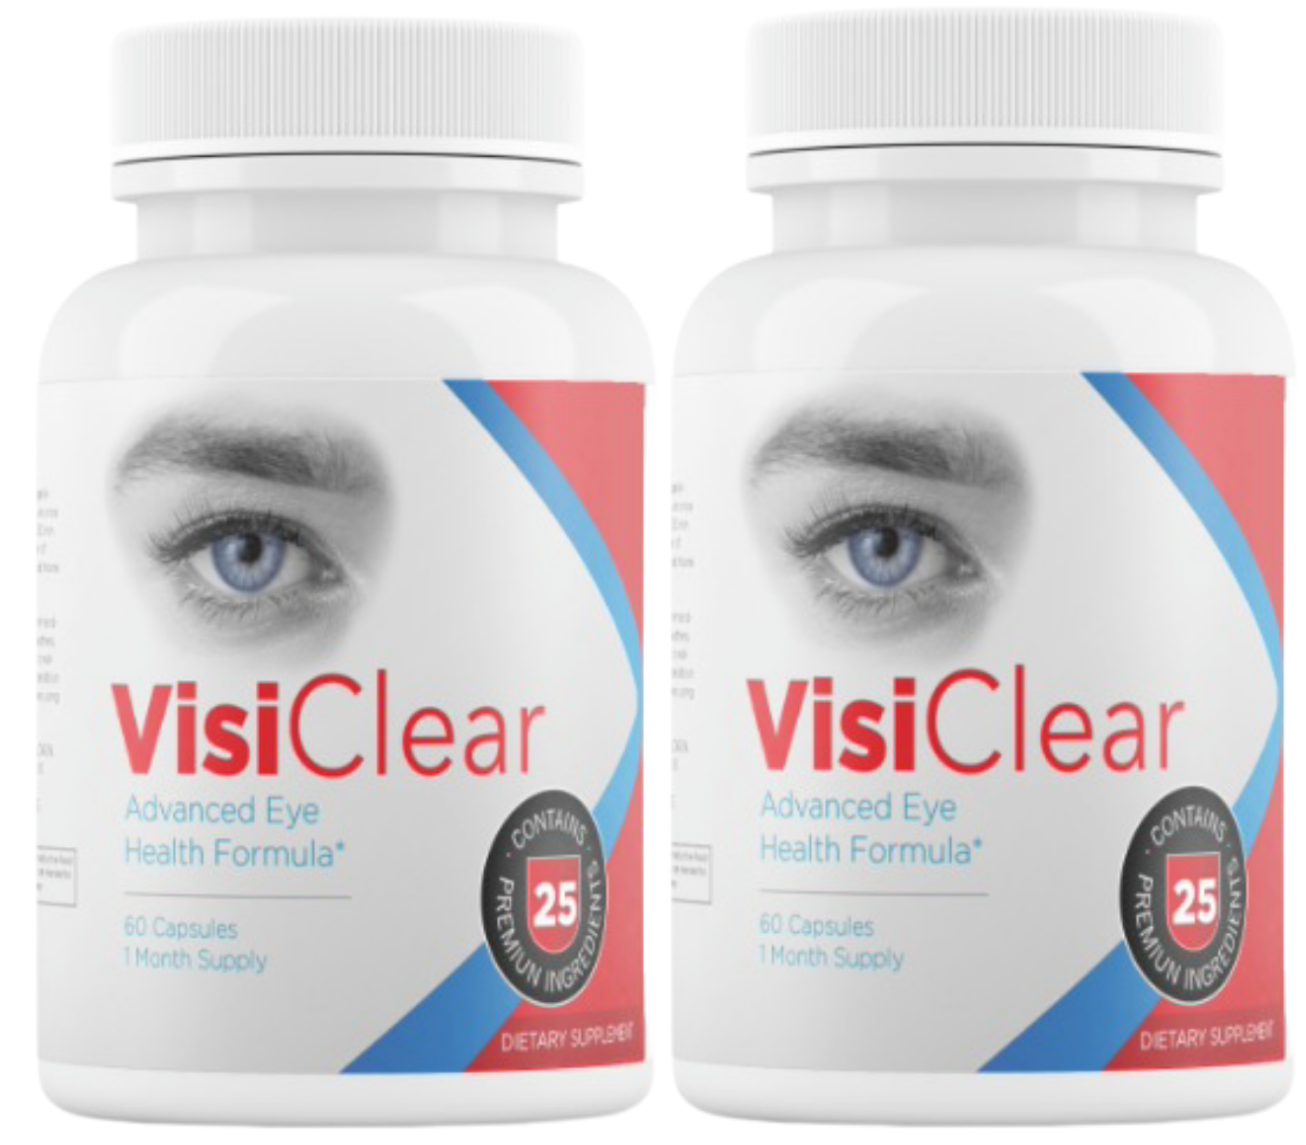 2 BOTTLES VisiClear Advanced Eye Health Formula 120 Capsules - 60 Day Supply